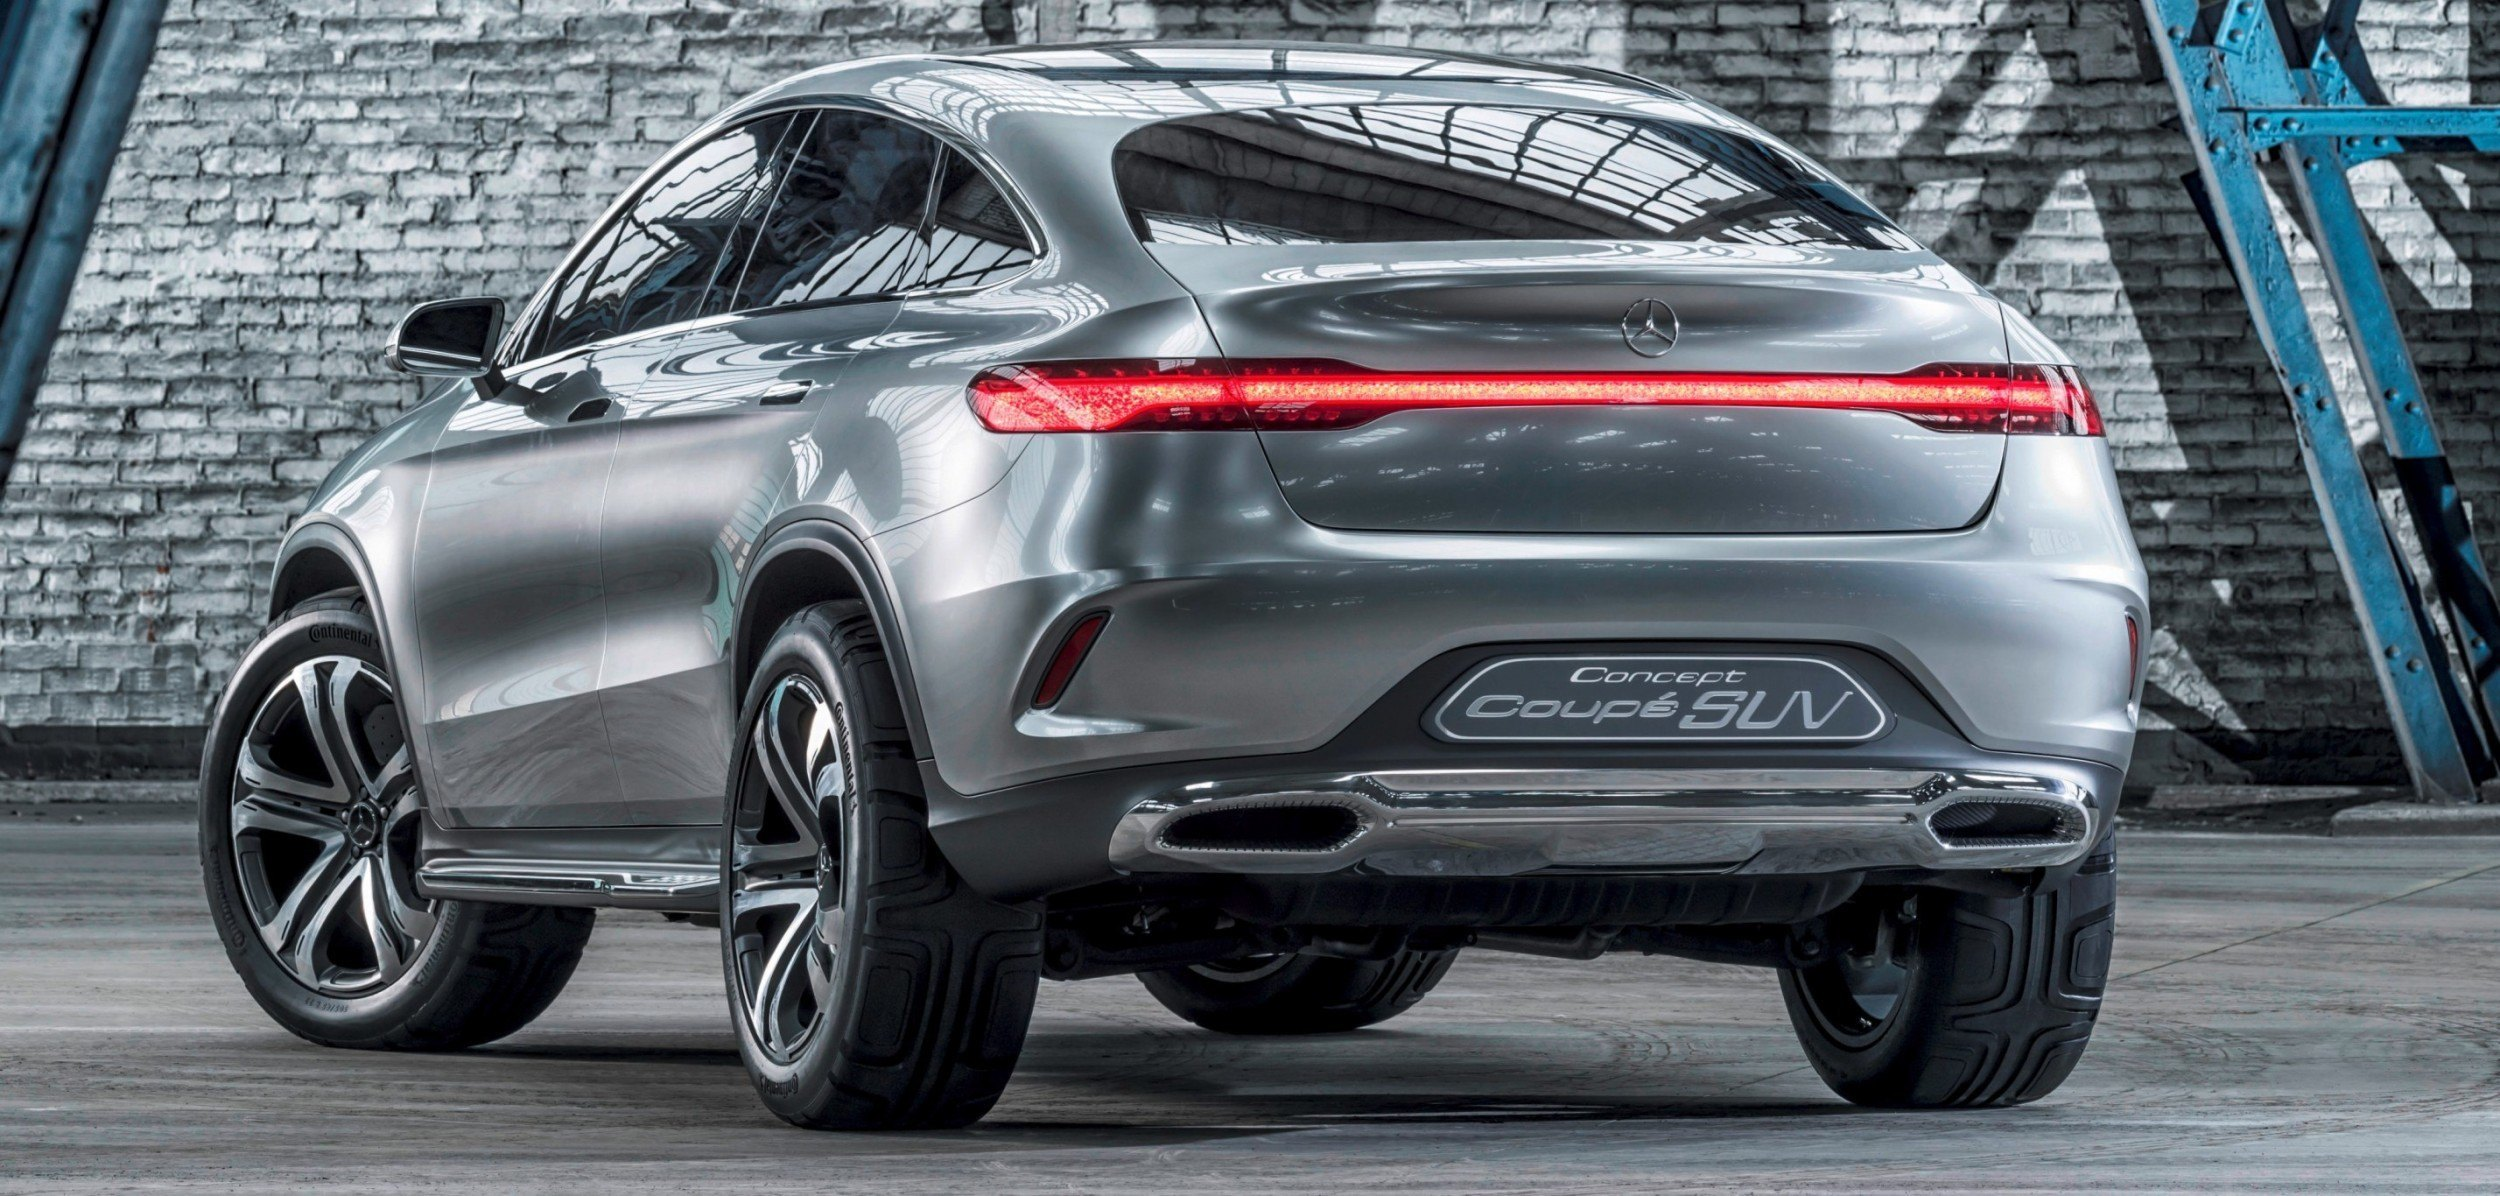 Mercedes Benz Concept Coupe Suv Beijing 2014 Sets New Design Direction